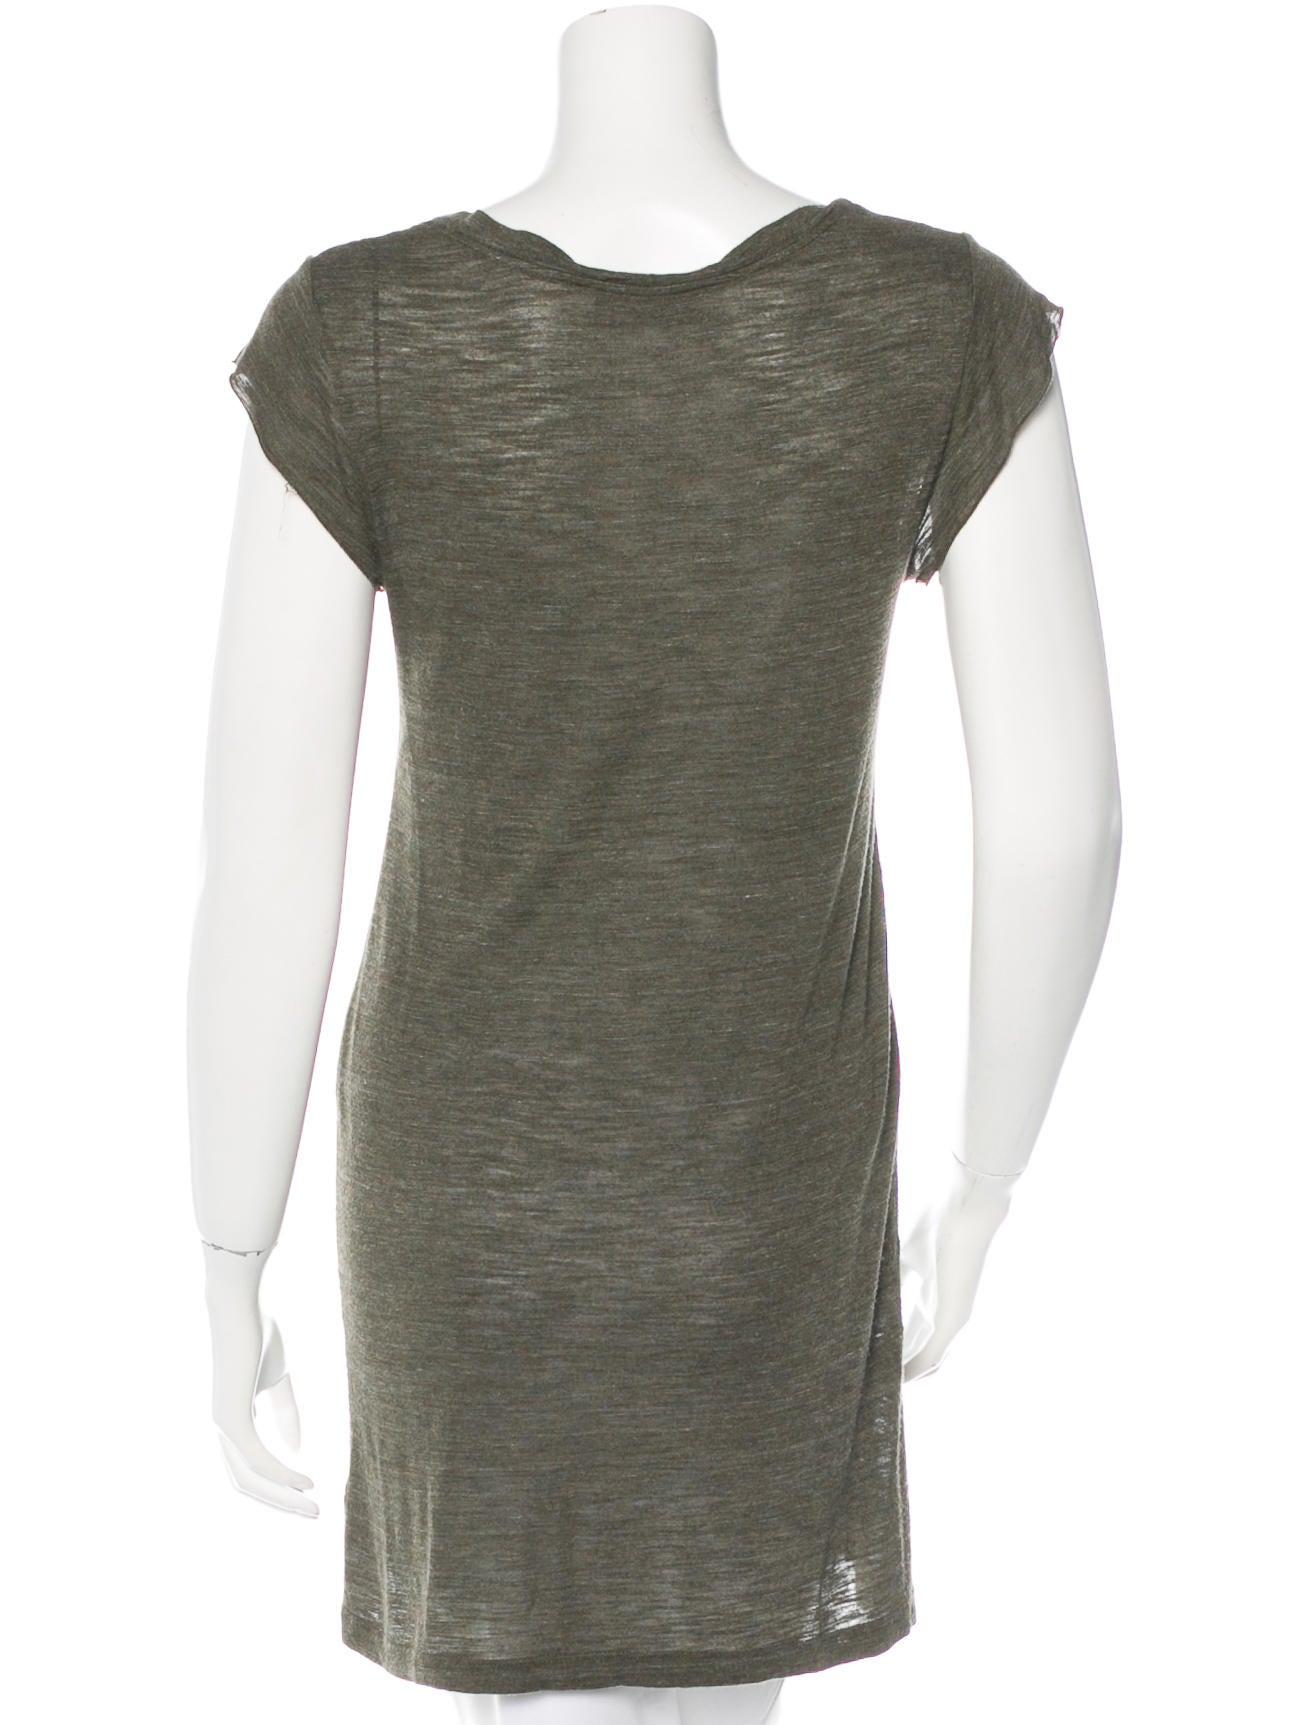 A l c raw edge v neck t shirt clothing wa430841 the for Raw edge t shirt women s